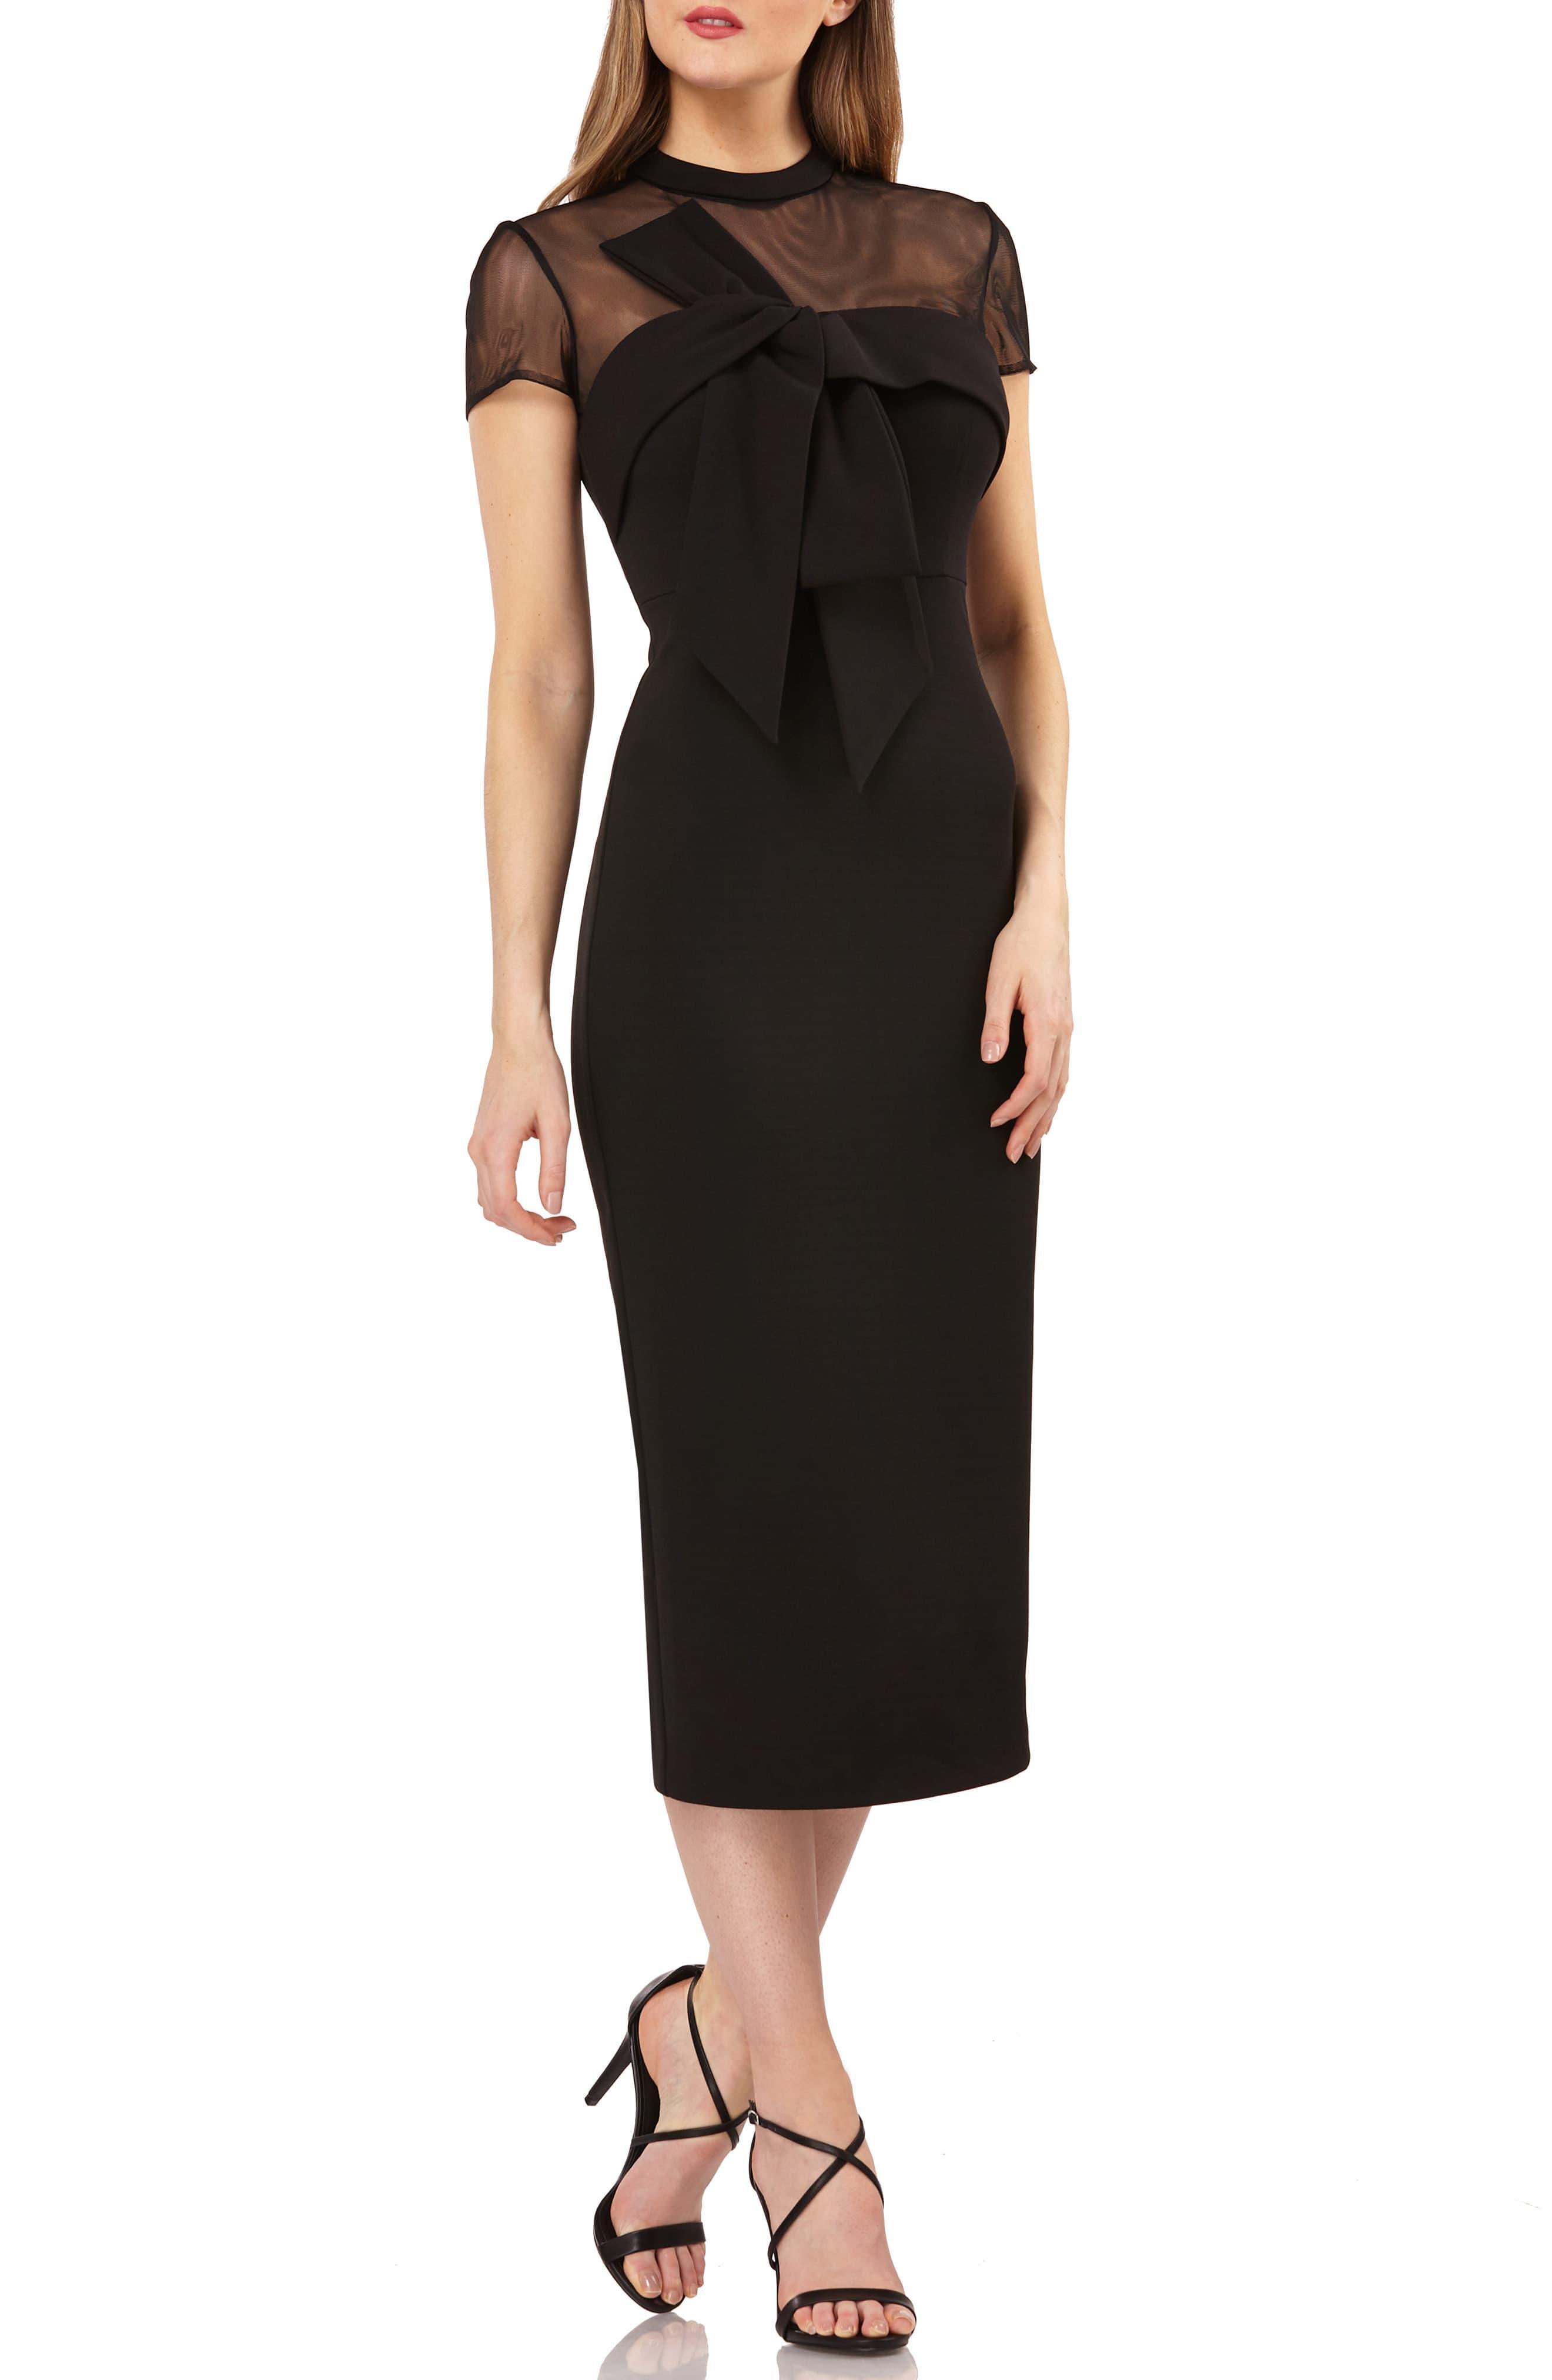 8c922aafa6a JS Collections Stretch Crepe Midi Dress in Black - Lyst